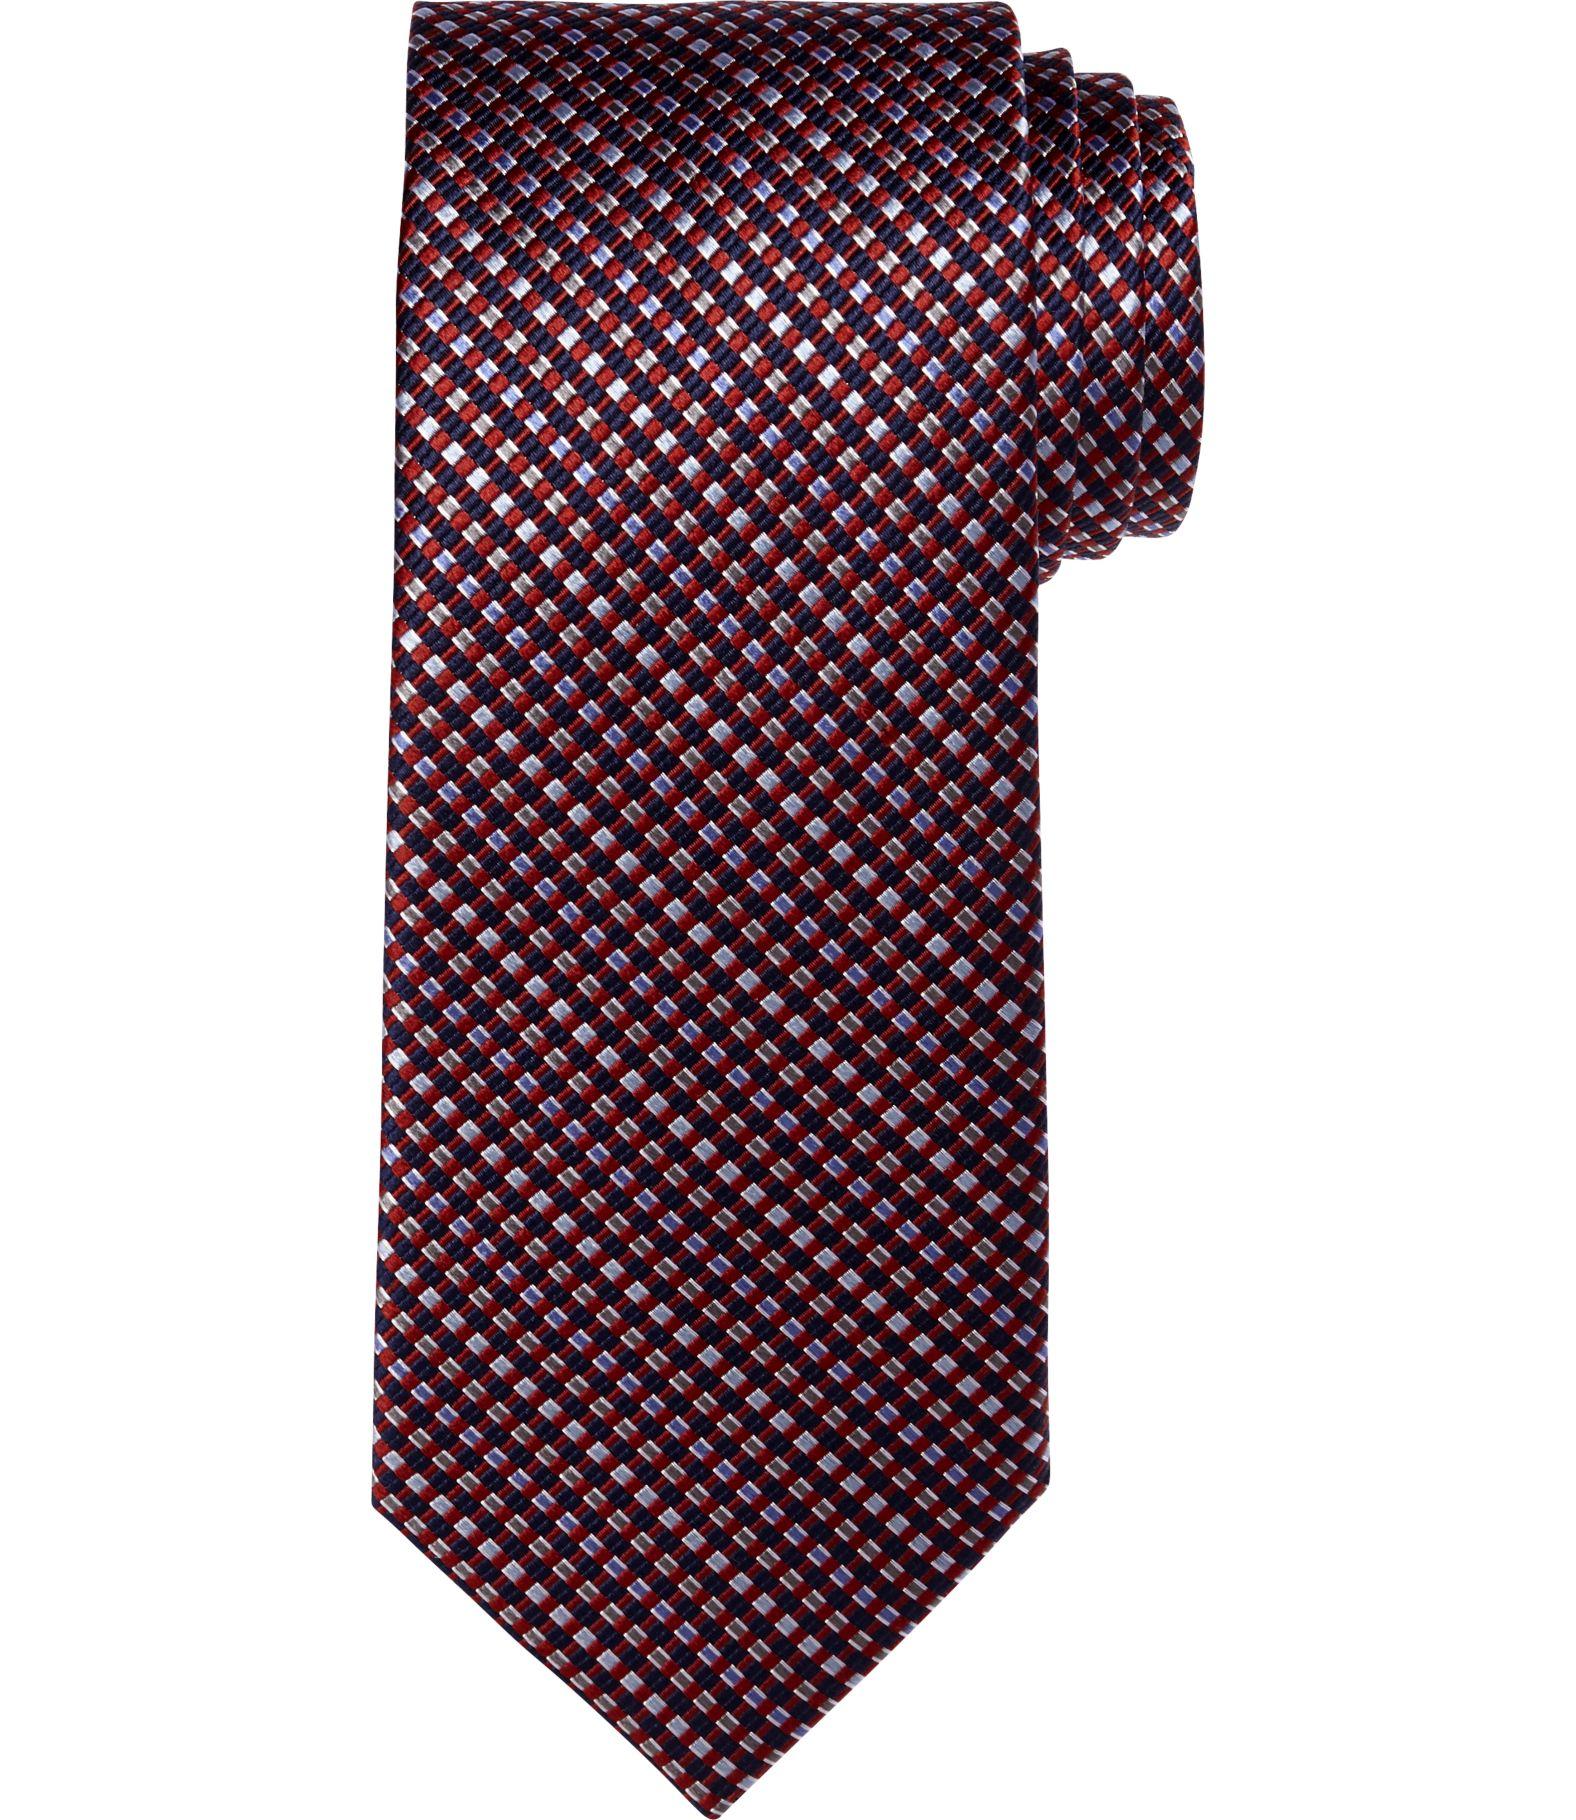 Men's Accessories, Traveler Collection Basketweave Tie  Jos A Bank